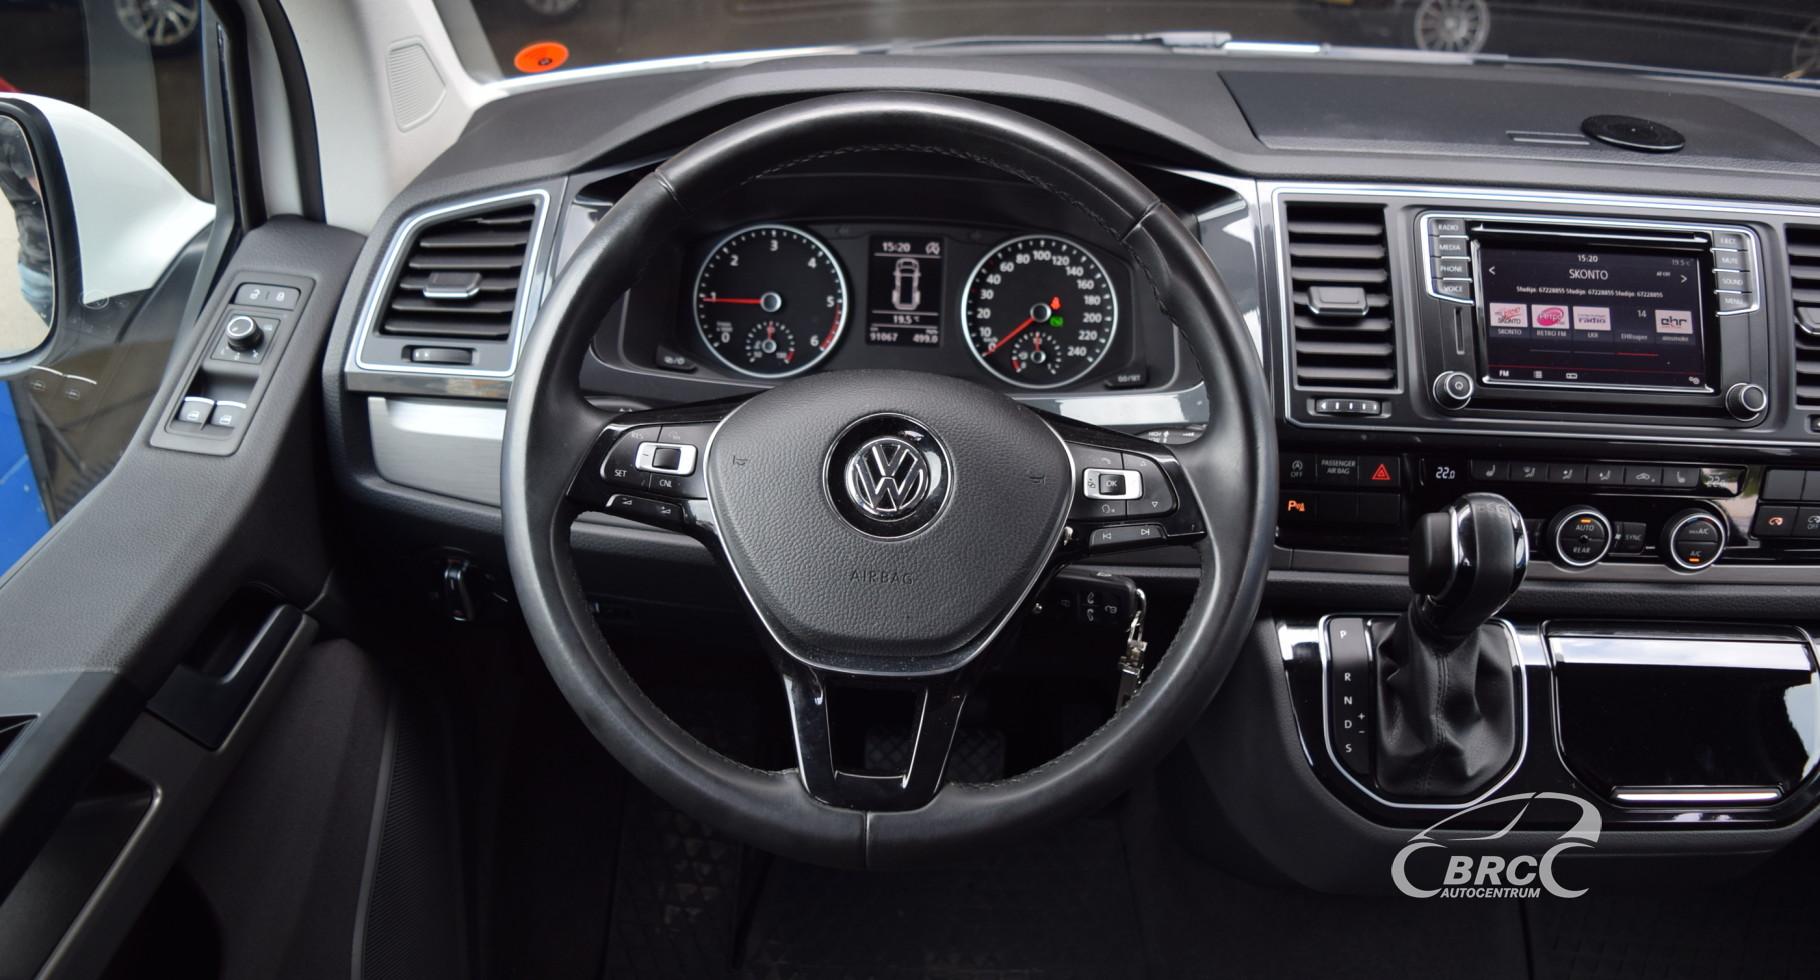 Volkswagen Multivan Long TDi DSG 7 seats